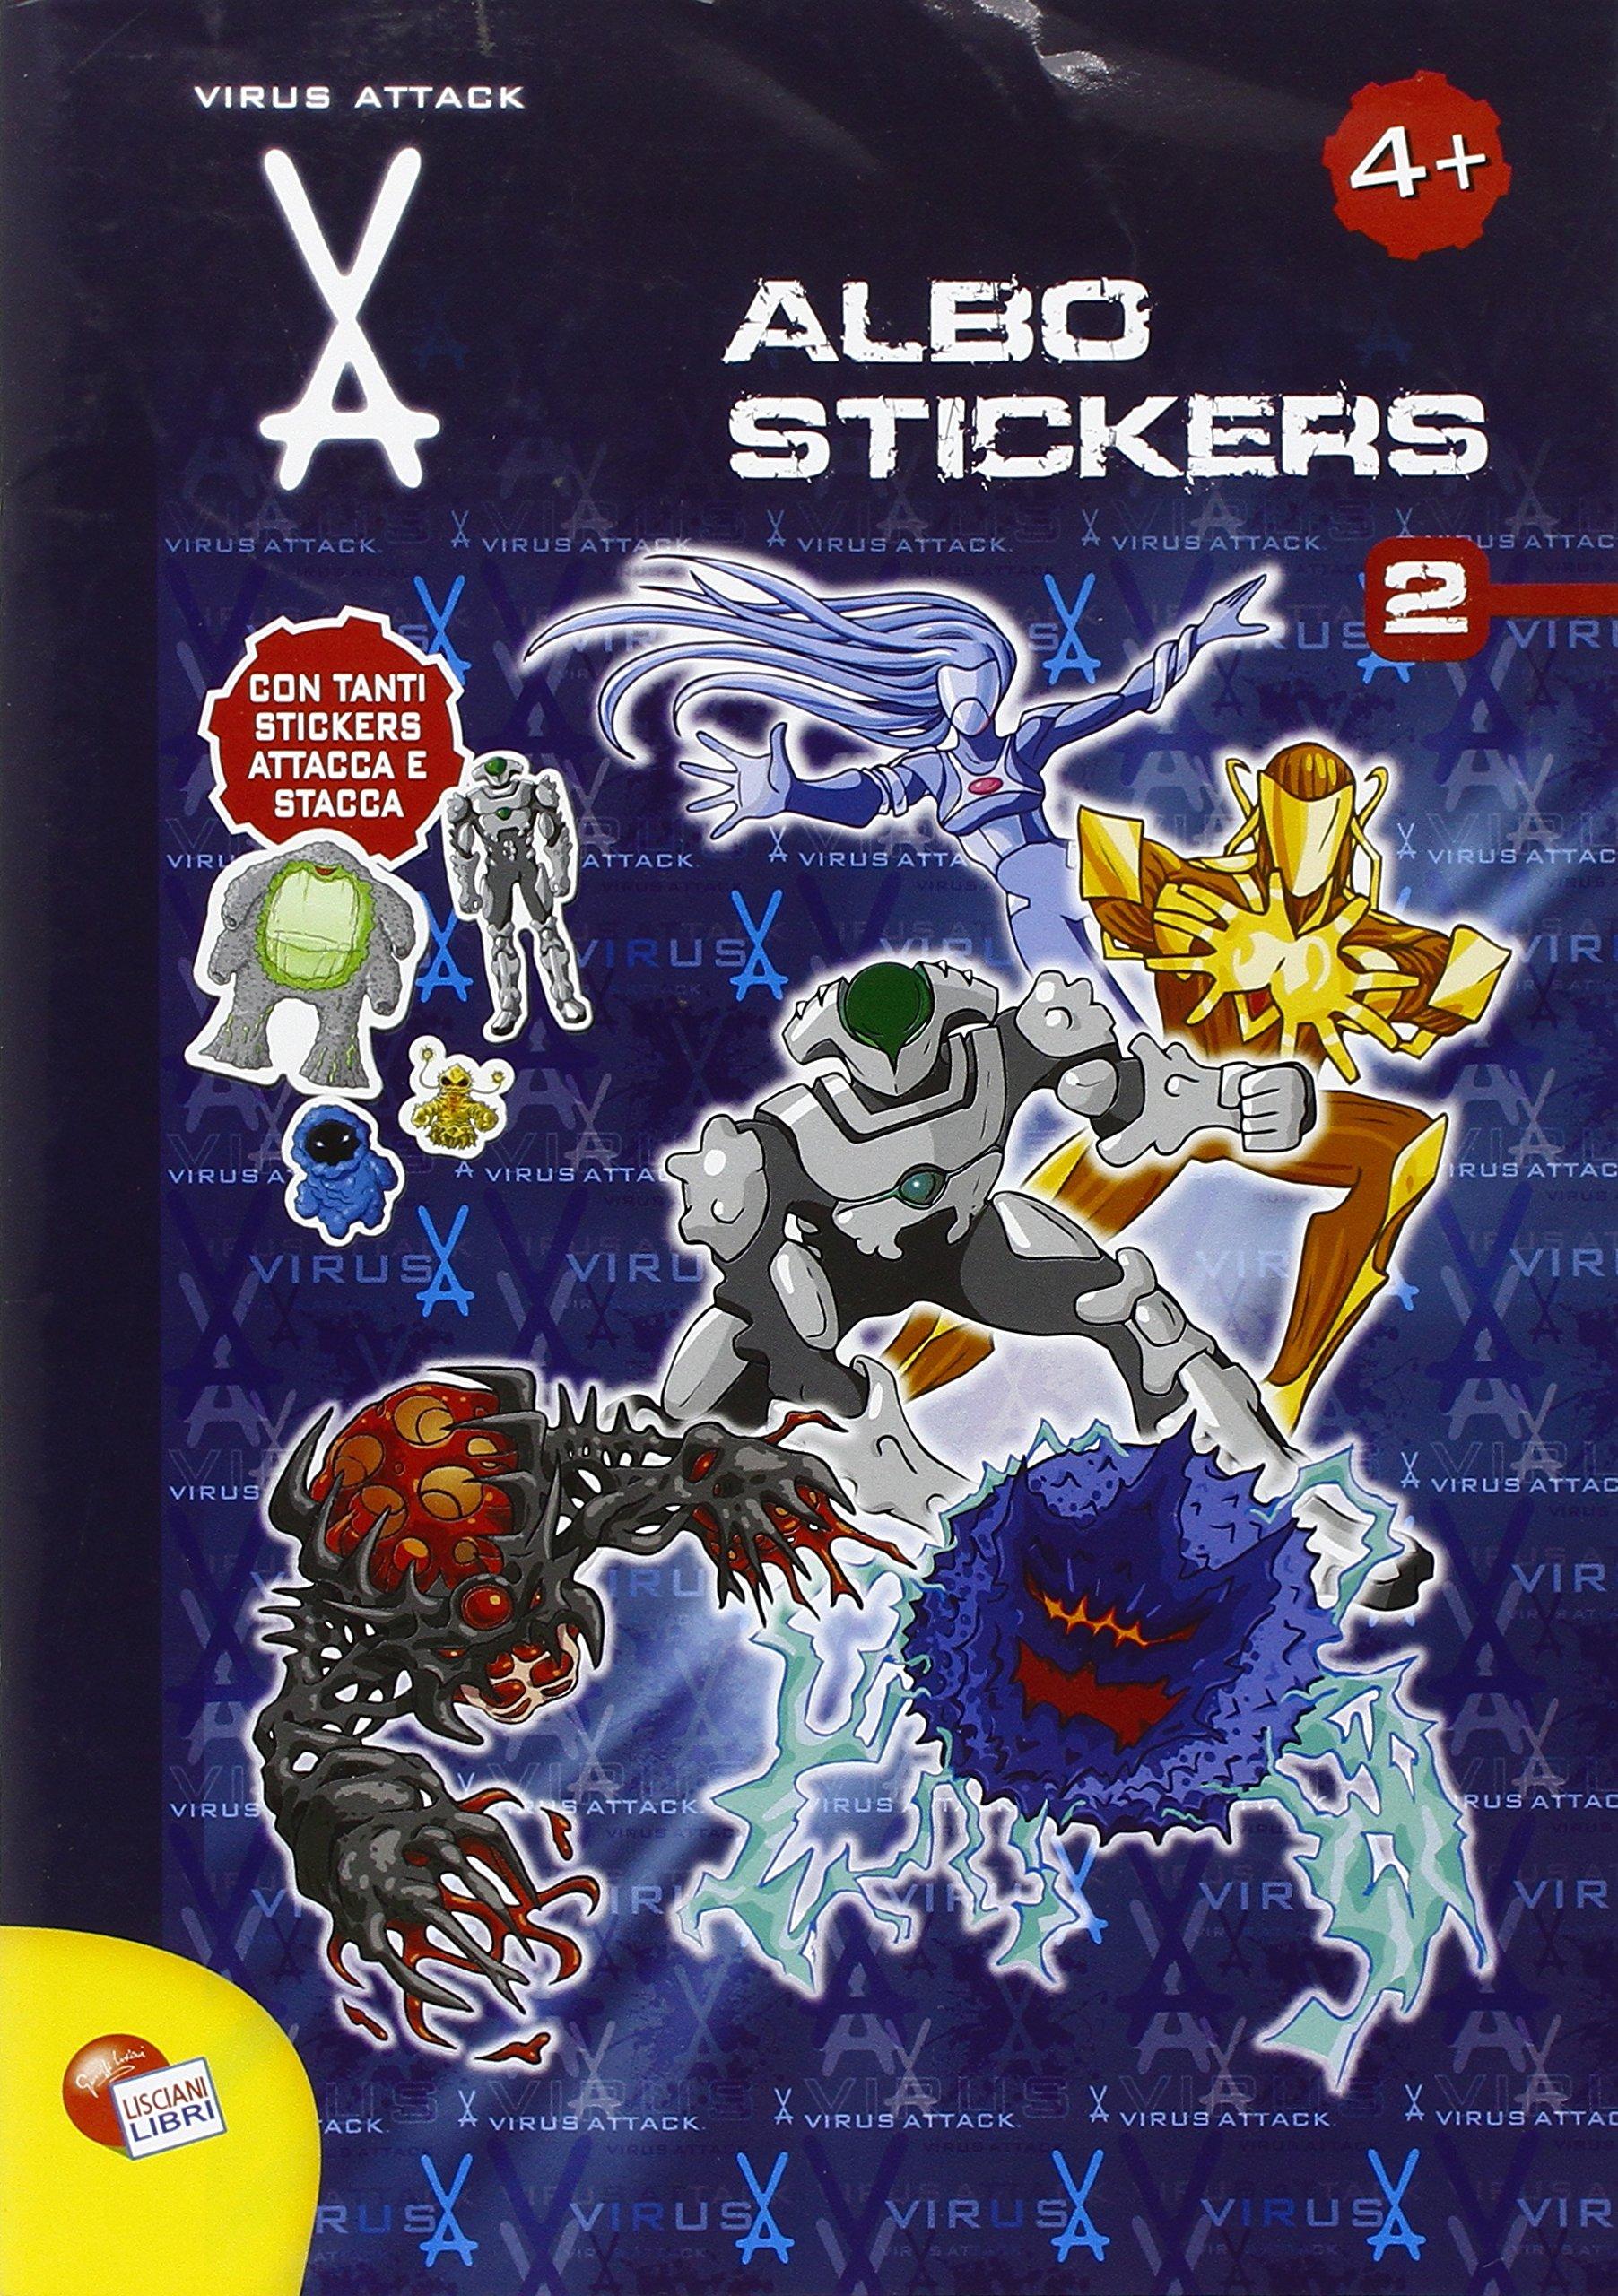 Virus attack. Albo stickers. Ediz. illustrata: 2: Amazon.es: Libros en idiomas extranjeros